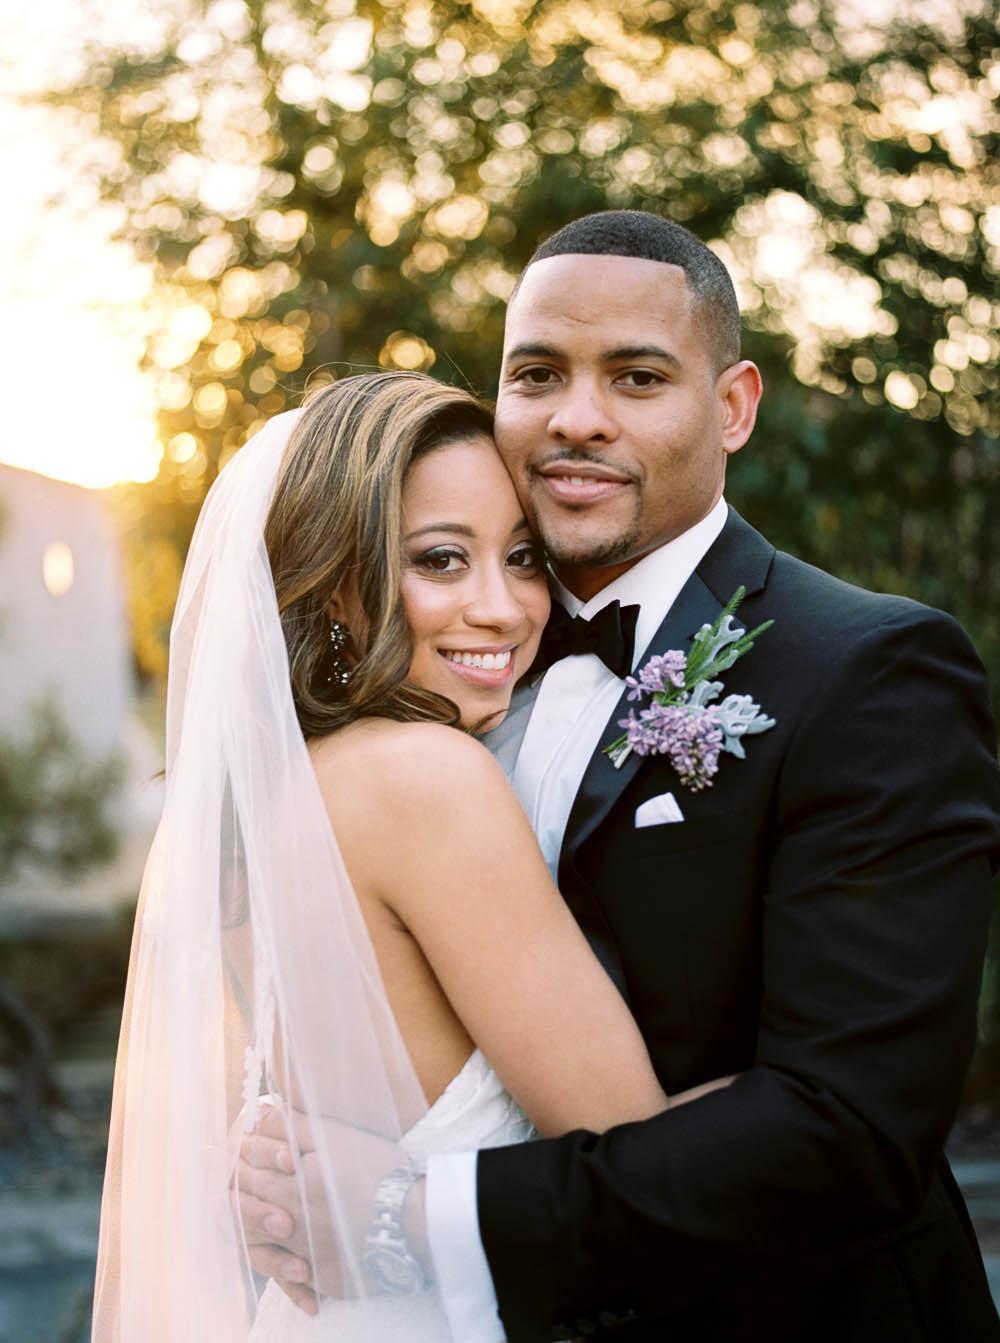 nashville ruby film documentary wedding photographer heartfelt real moments african american wedding munalachi bride ©2016abigailbobophotography-36.jpg